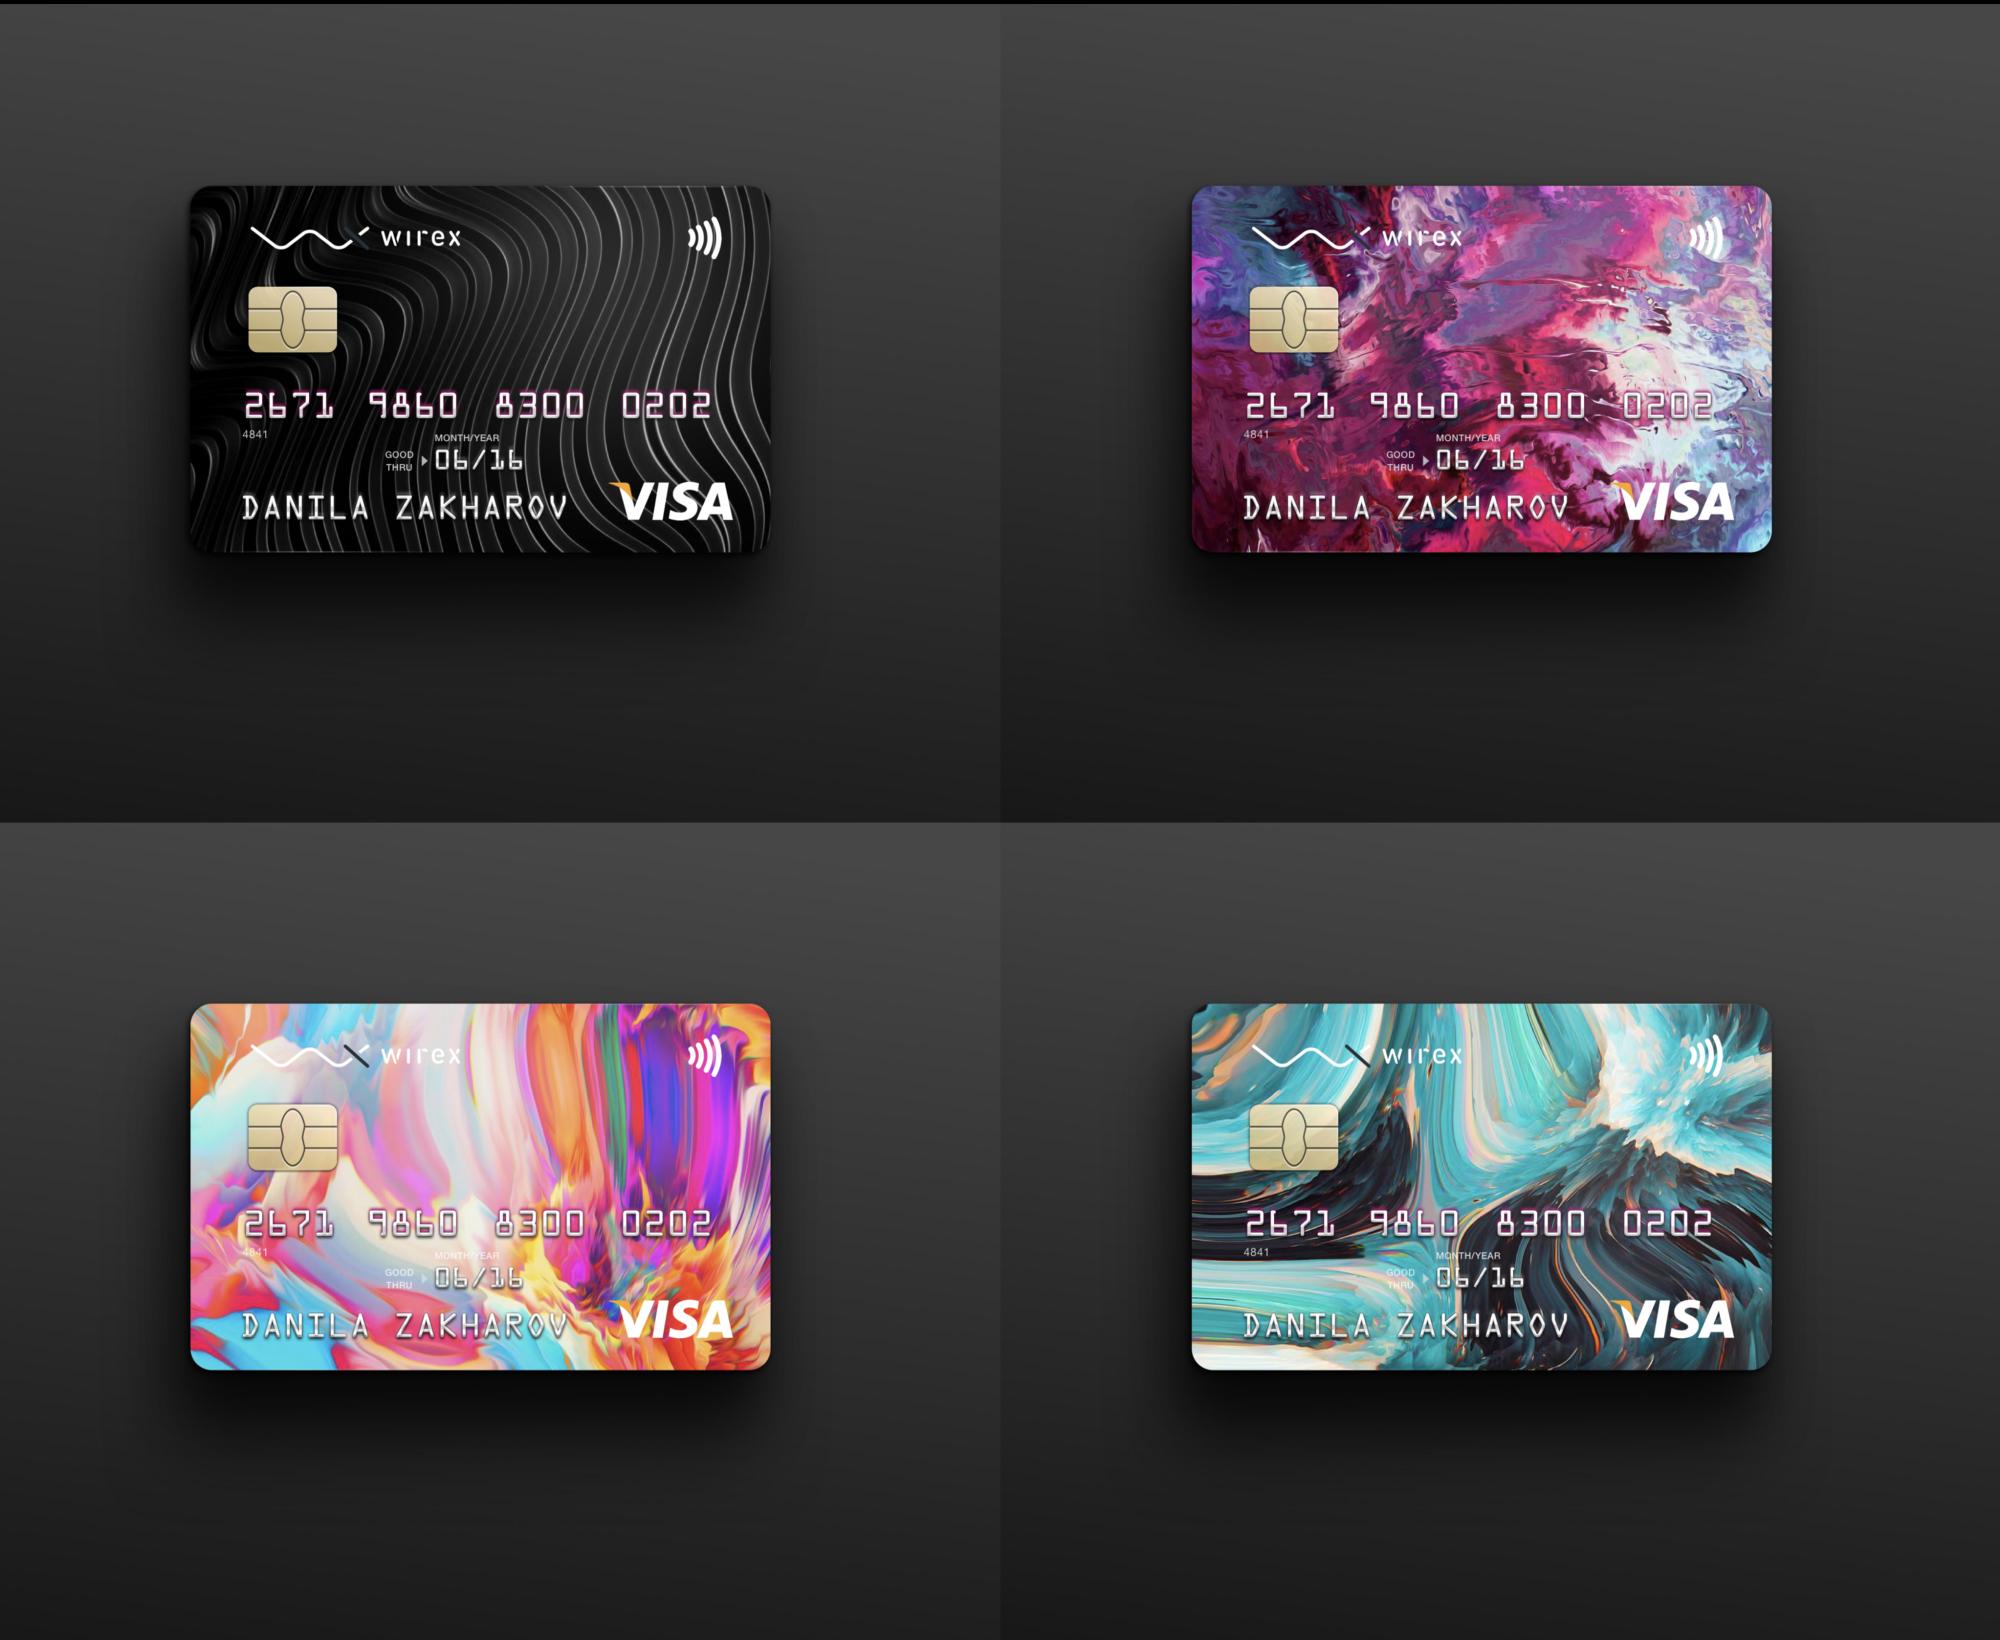 Wirex Card A Look Behind The Design Debit Card Design Credit Card Design Credit Card Art